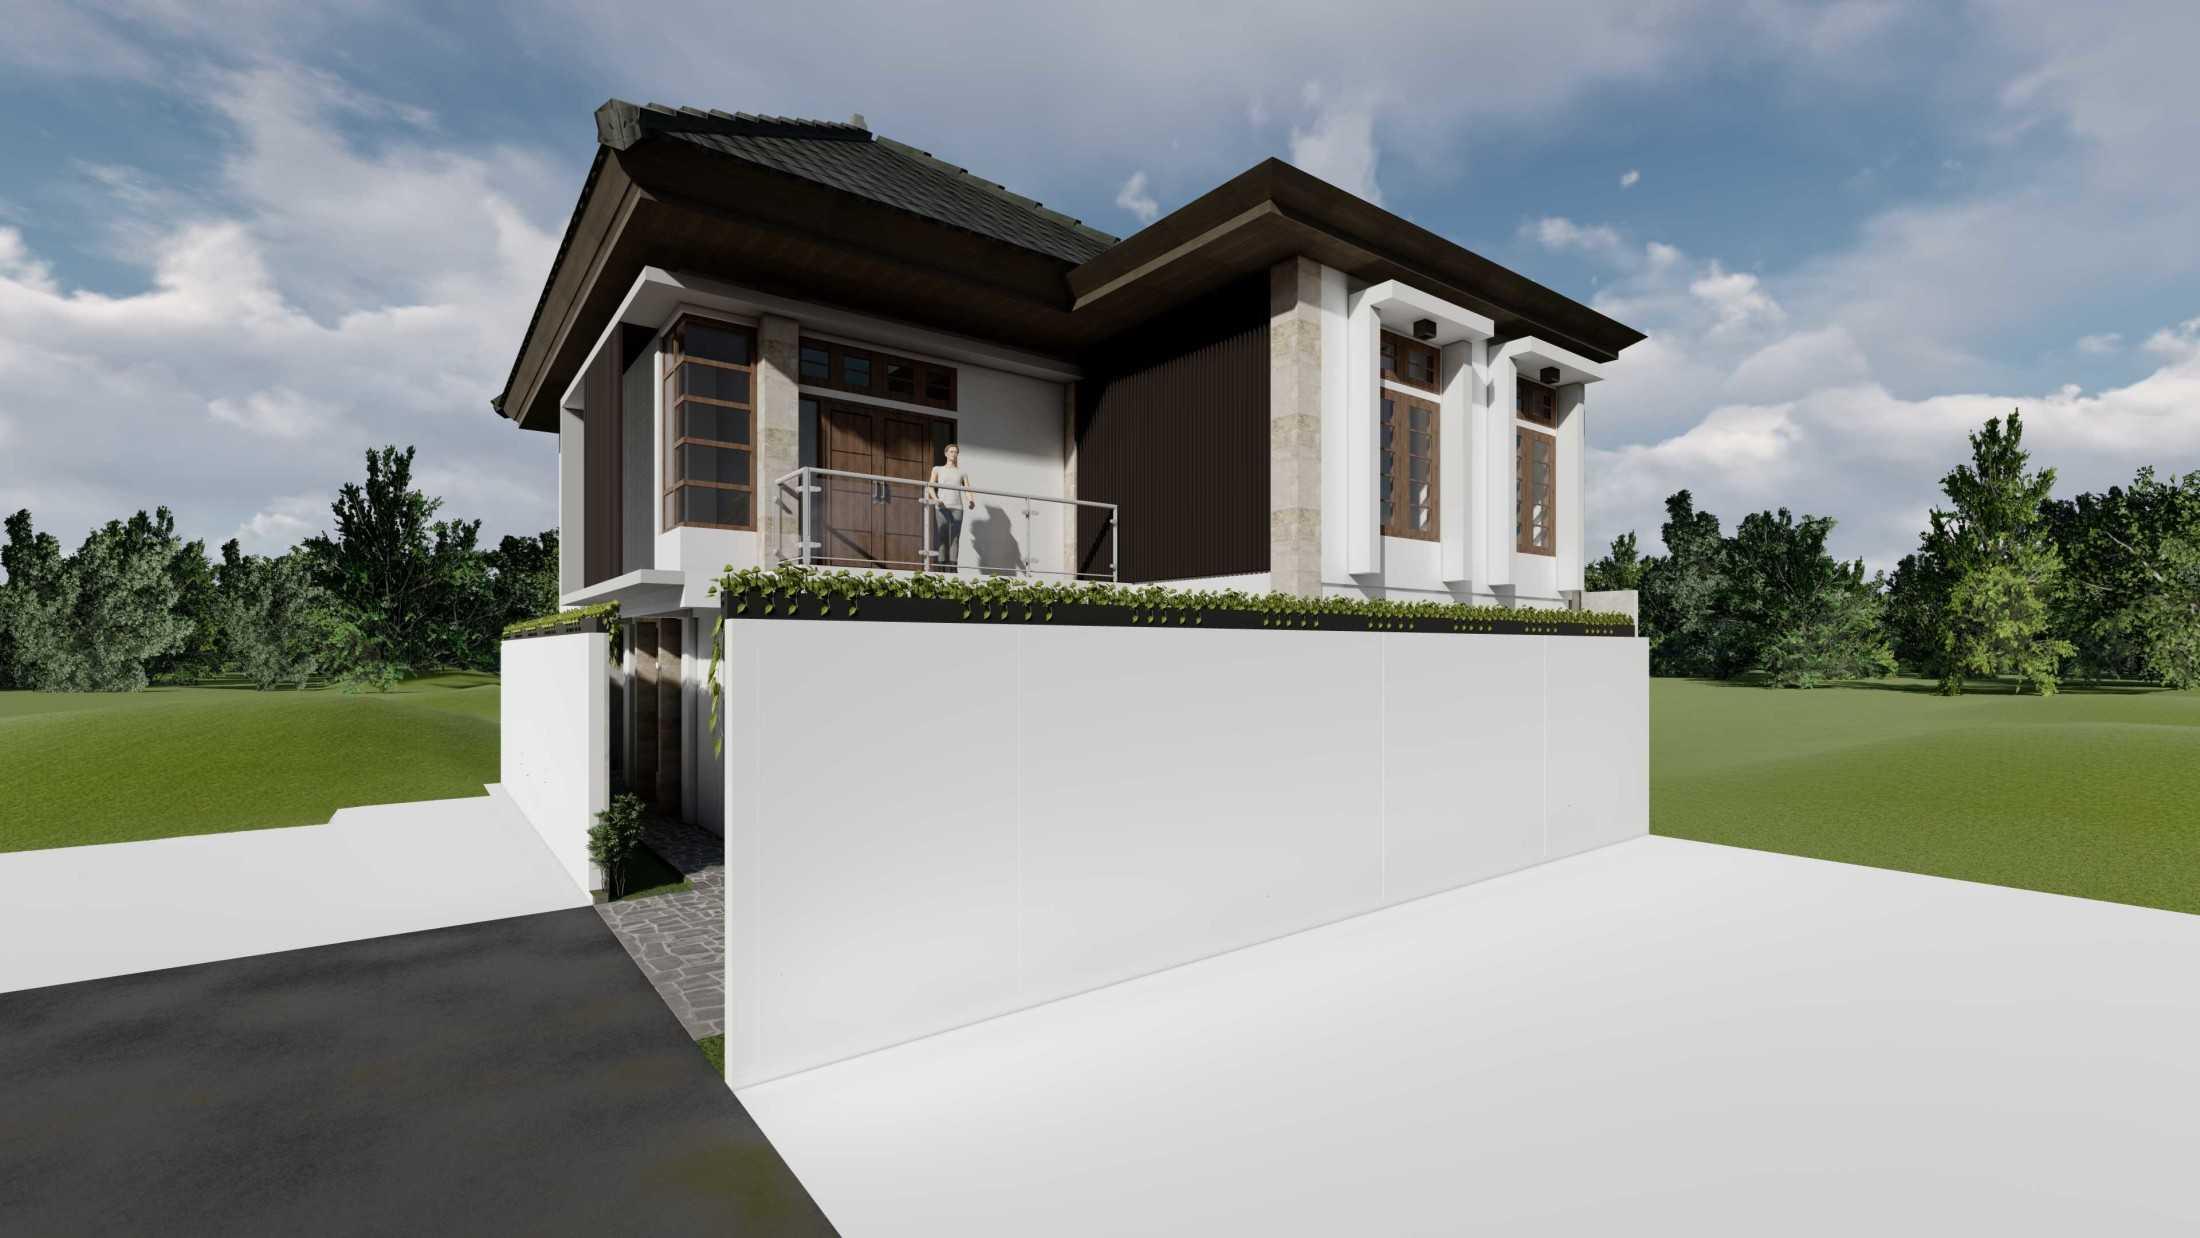 Astabumi Studio Js House Timor Leste Dili, Timor-Leste Pati, Kec. Pati, Kabupaten Pati, Jawa Tengah, Indonesia Cv-Astabumi-Manunggal-Prakarsa-Js-House-Timor-Leste  119257